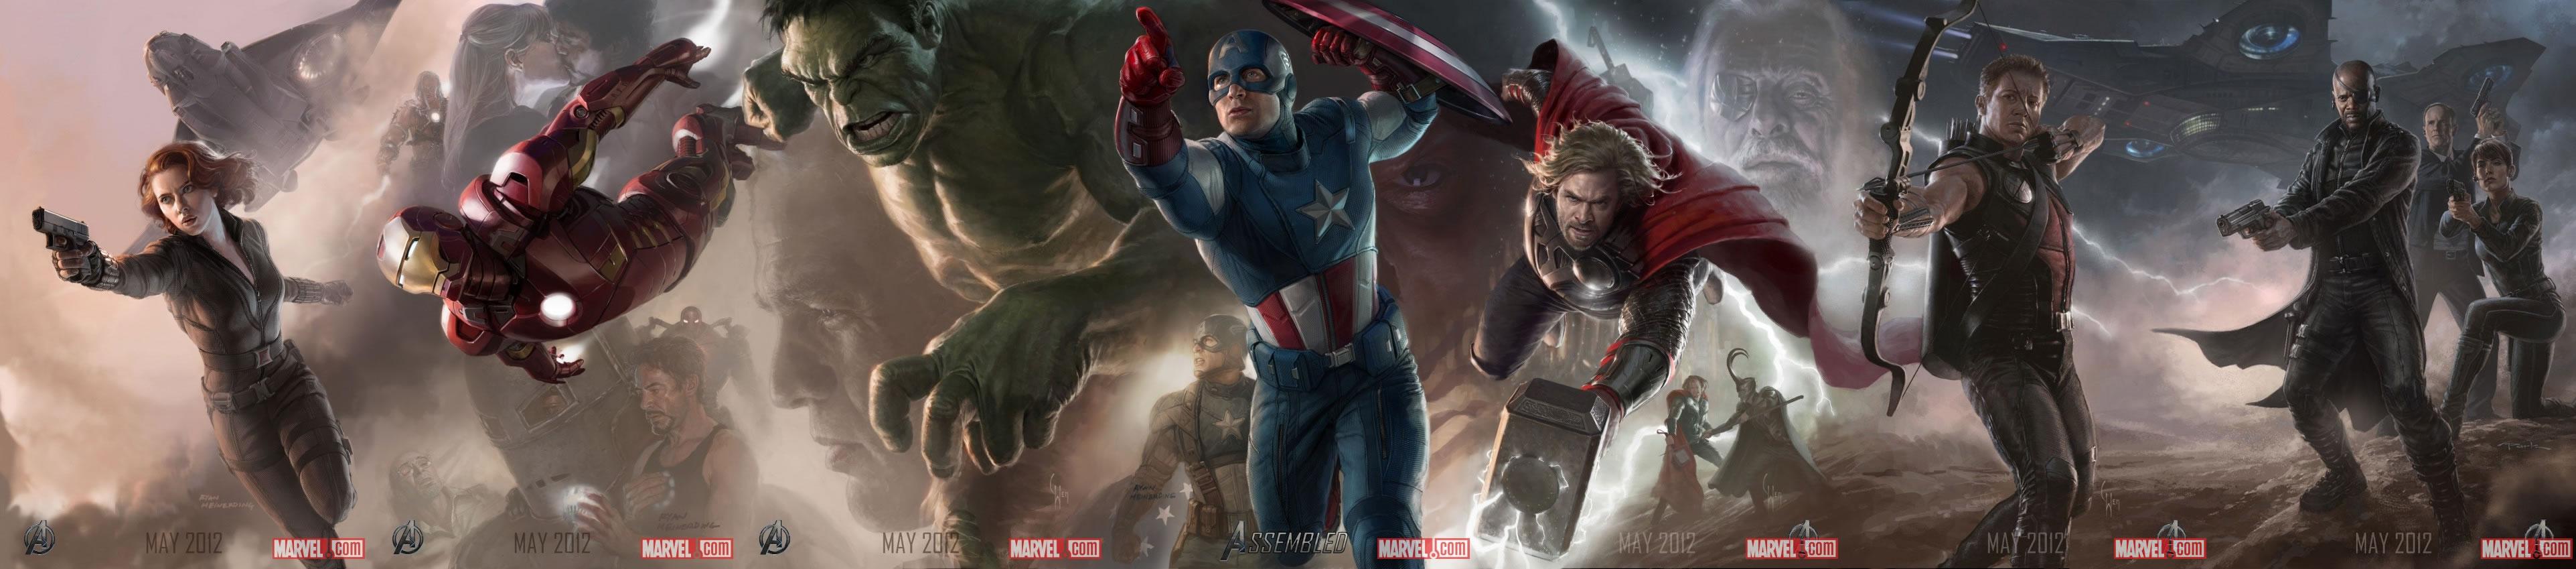 The Captain America/Chris Evans Thread - Page 3 Avengersassemblelarge